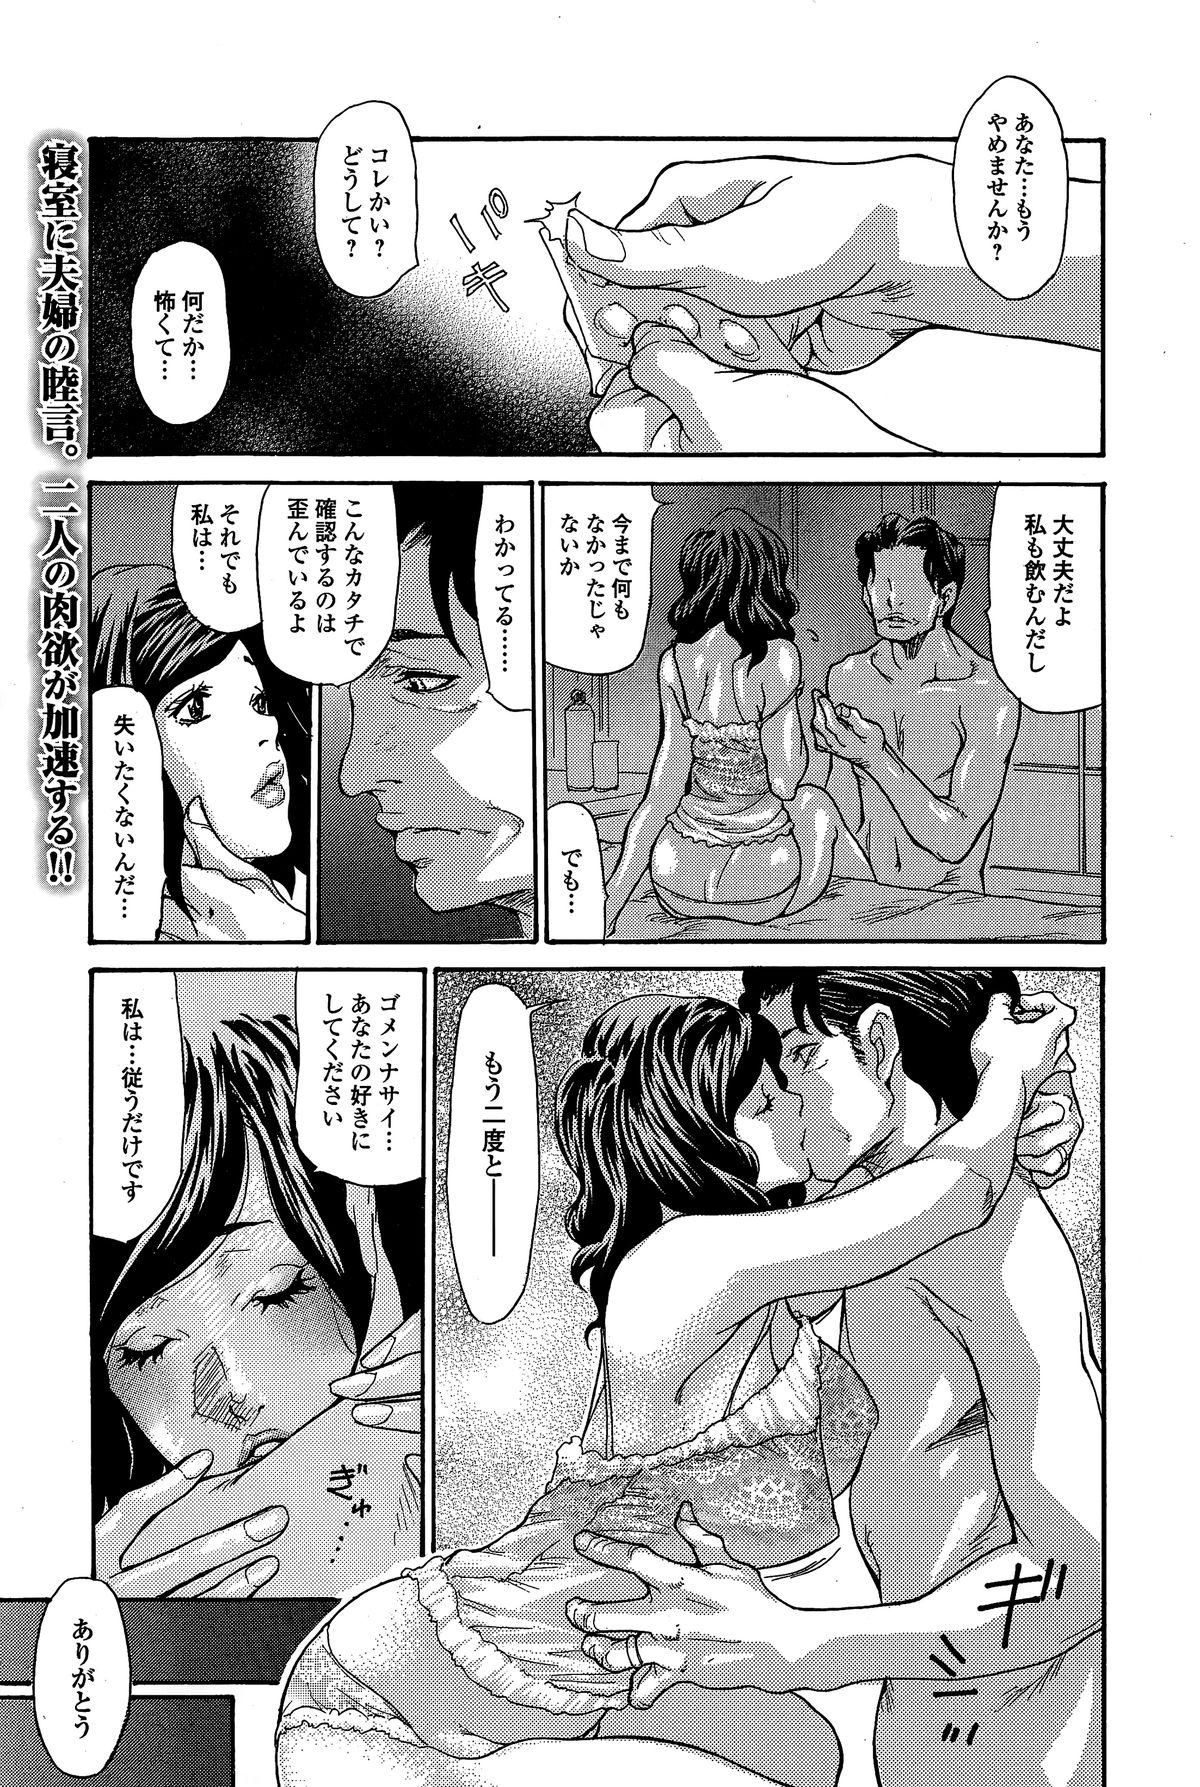 Comic Toutetsu 2015-02 Vol. 3 120